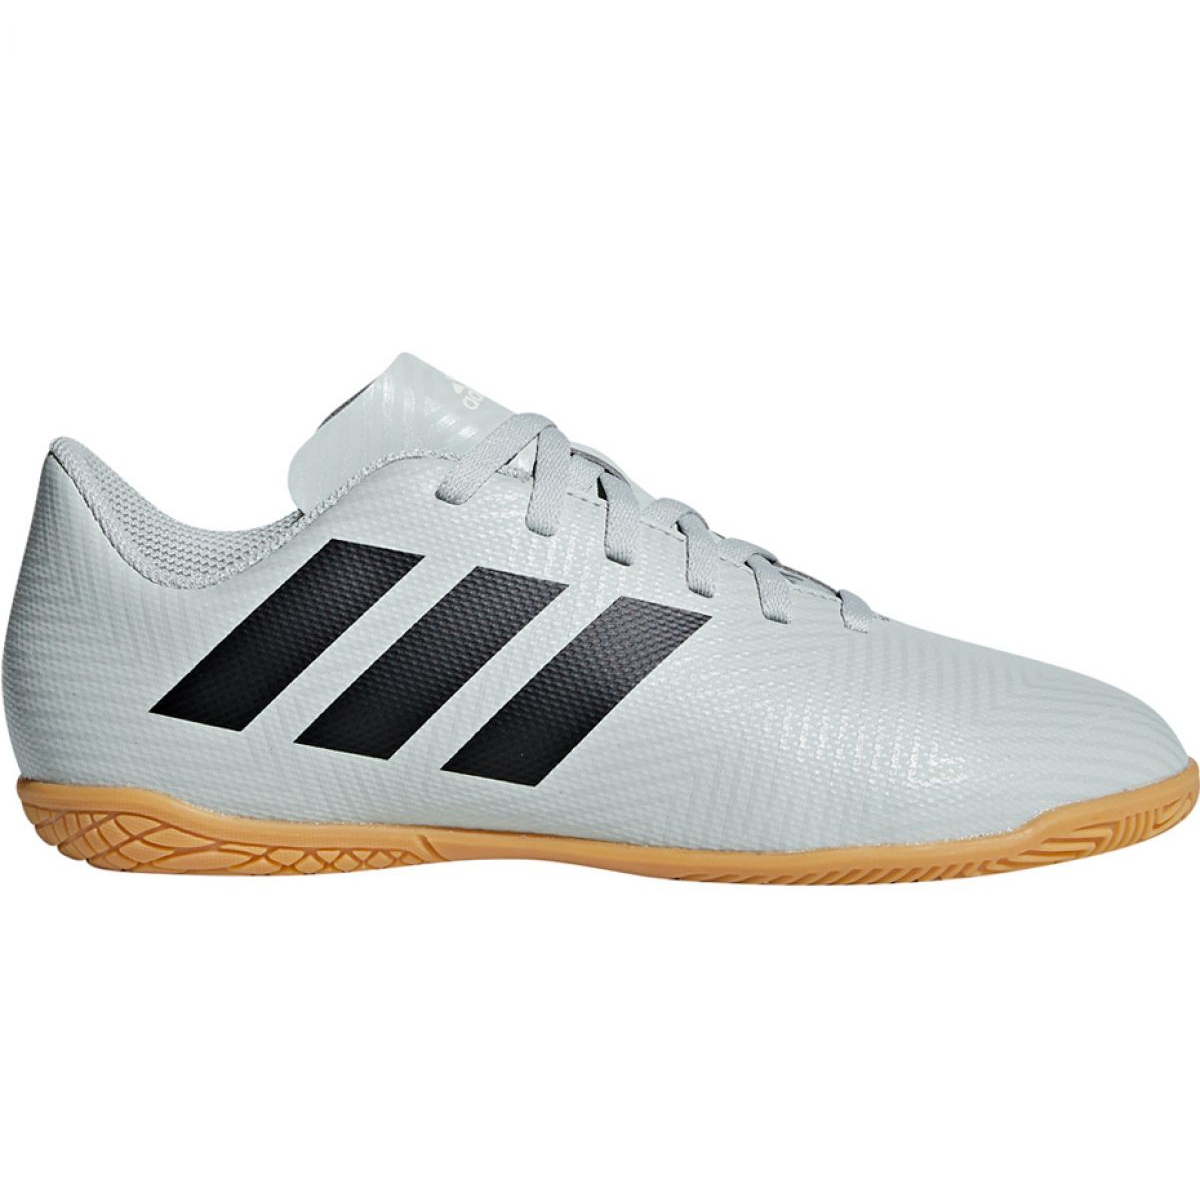 Details about Adidas Nemeziz Tango indoor shoes 18.4 In Jr DB2383 white white